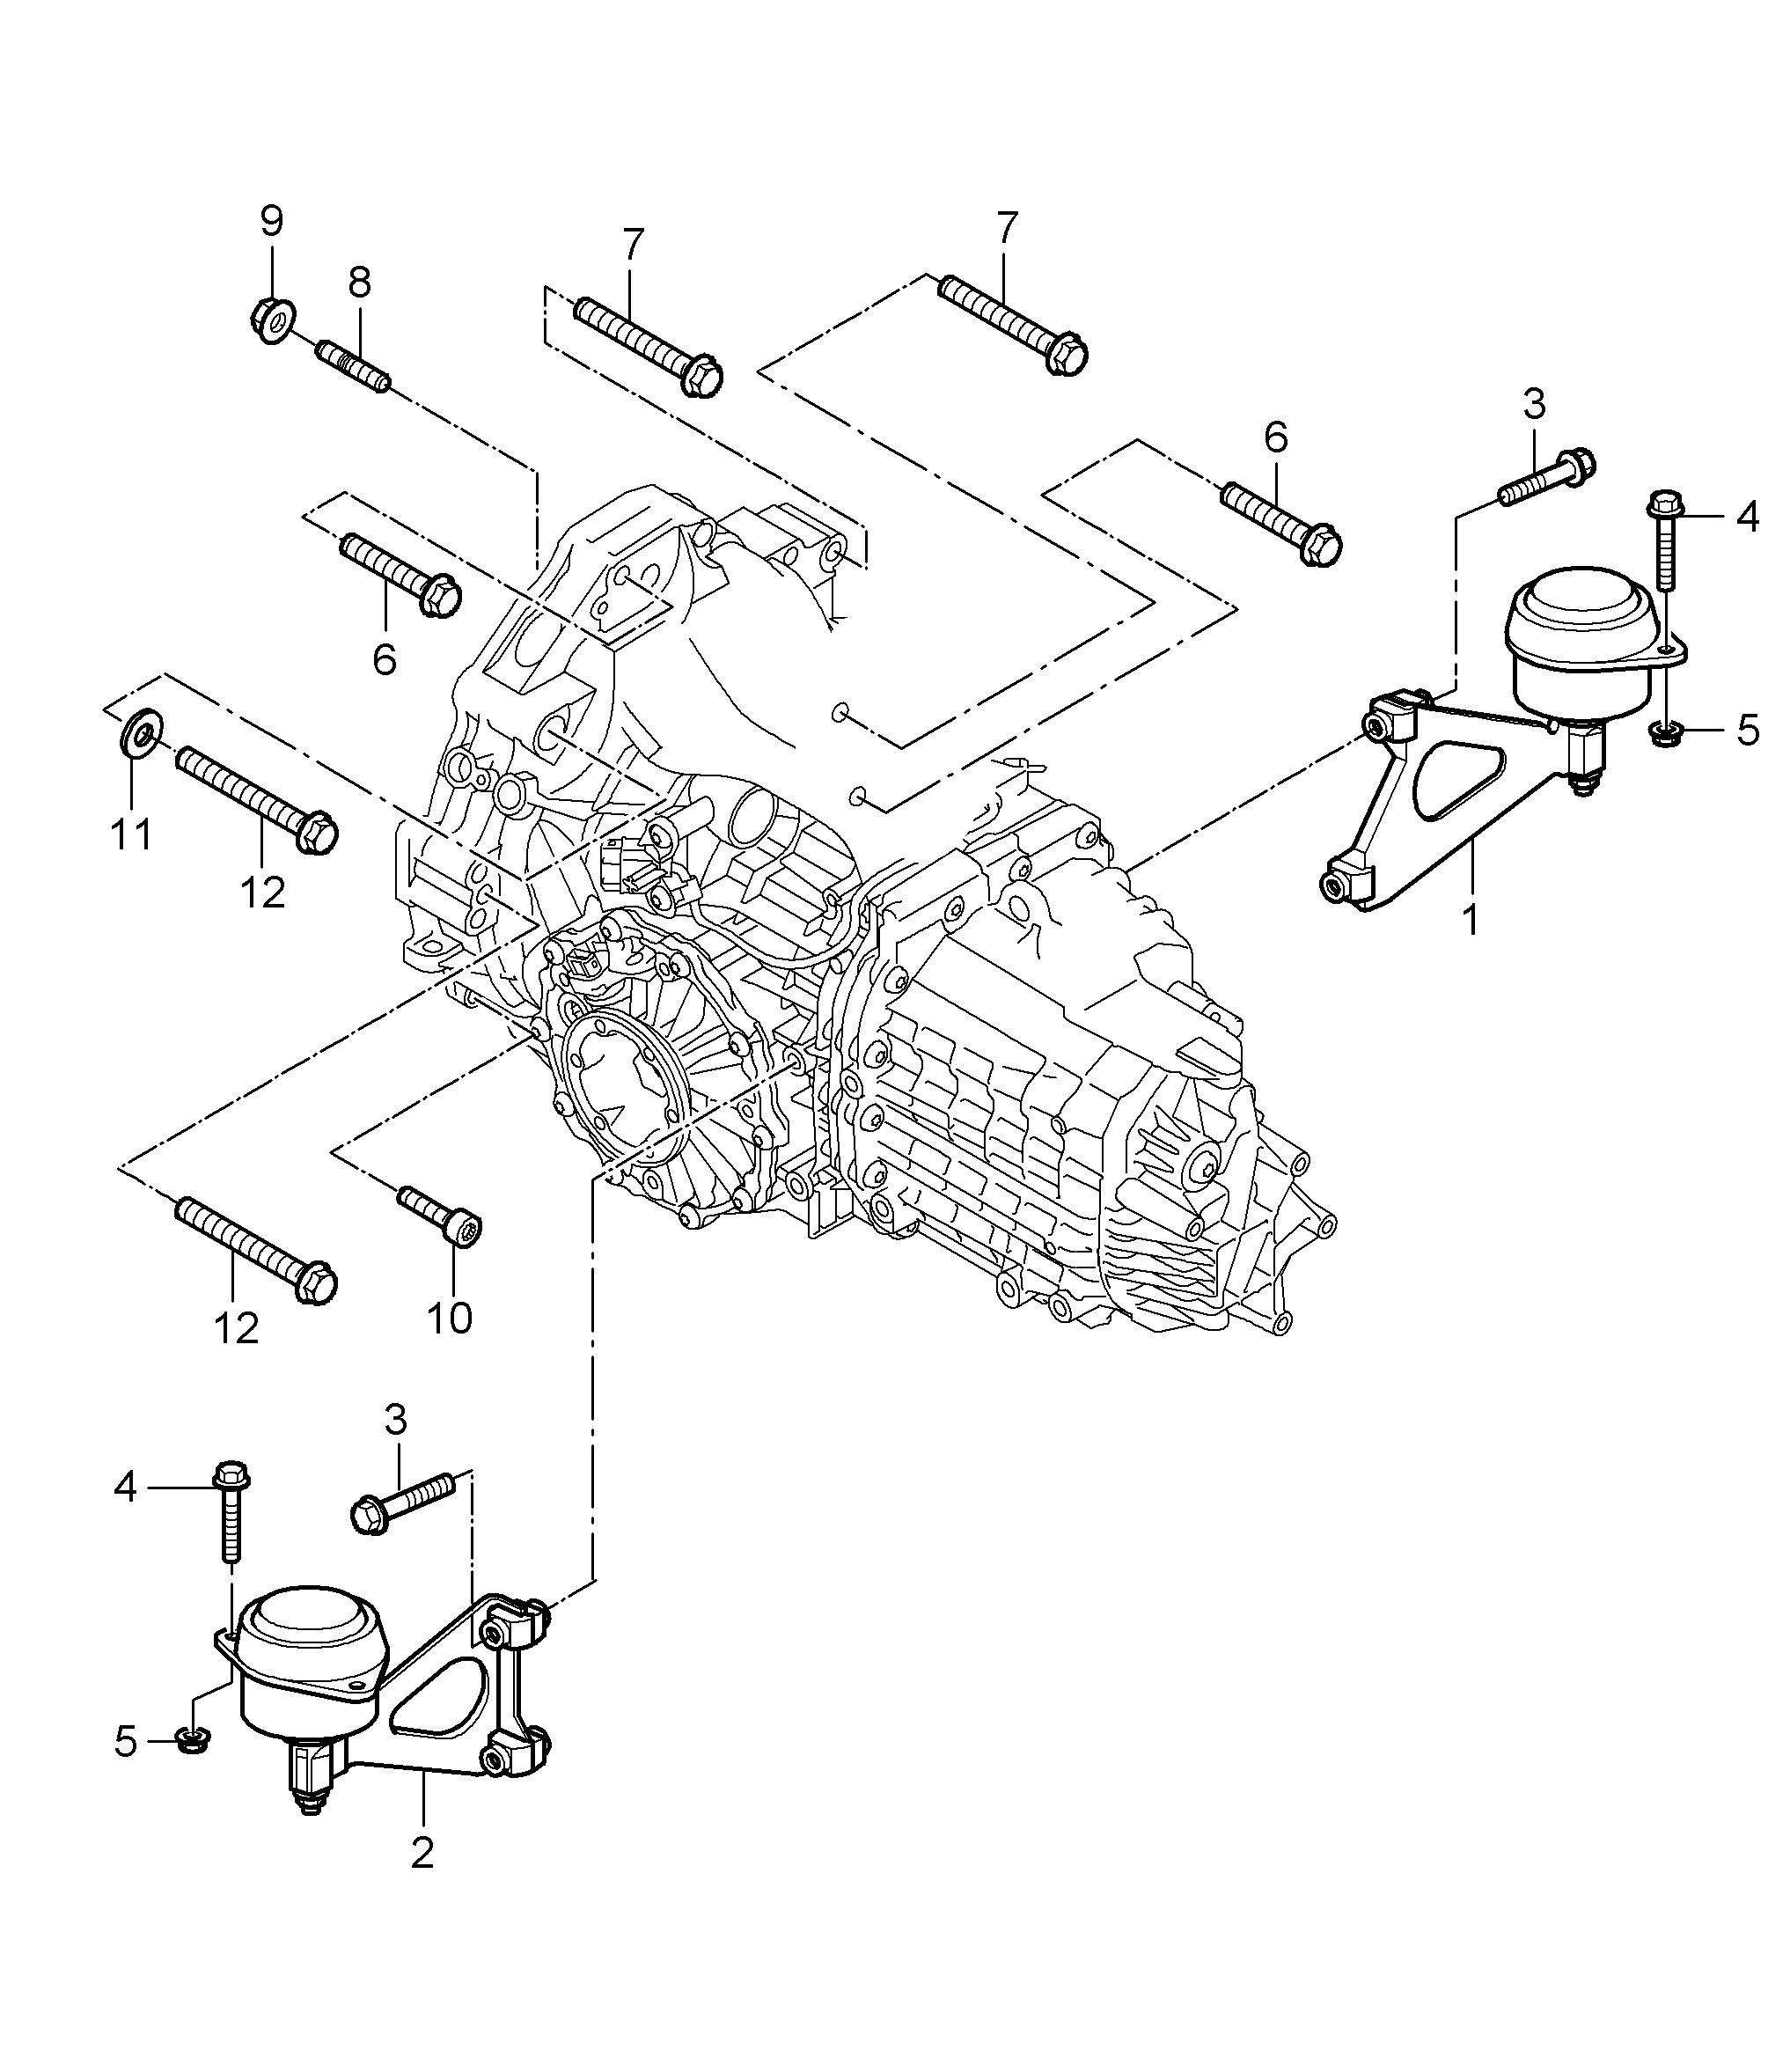 Porsche Boxster 2005 2008 Engine Threaded Joint Manual Diagram Pet